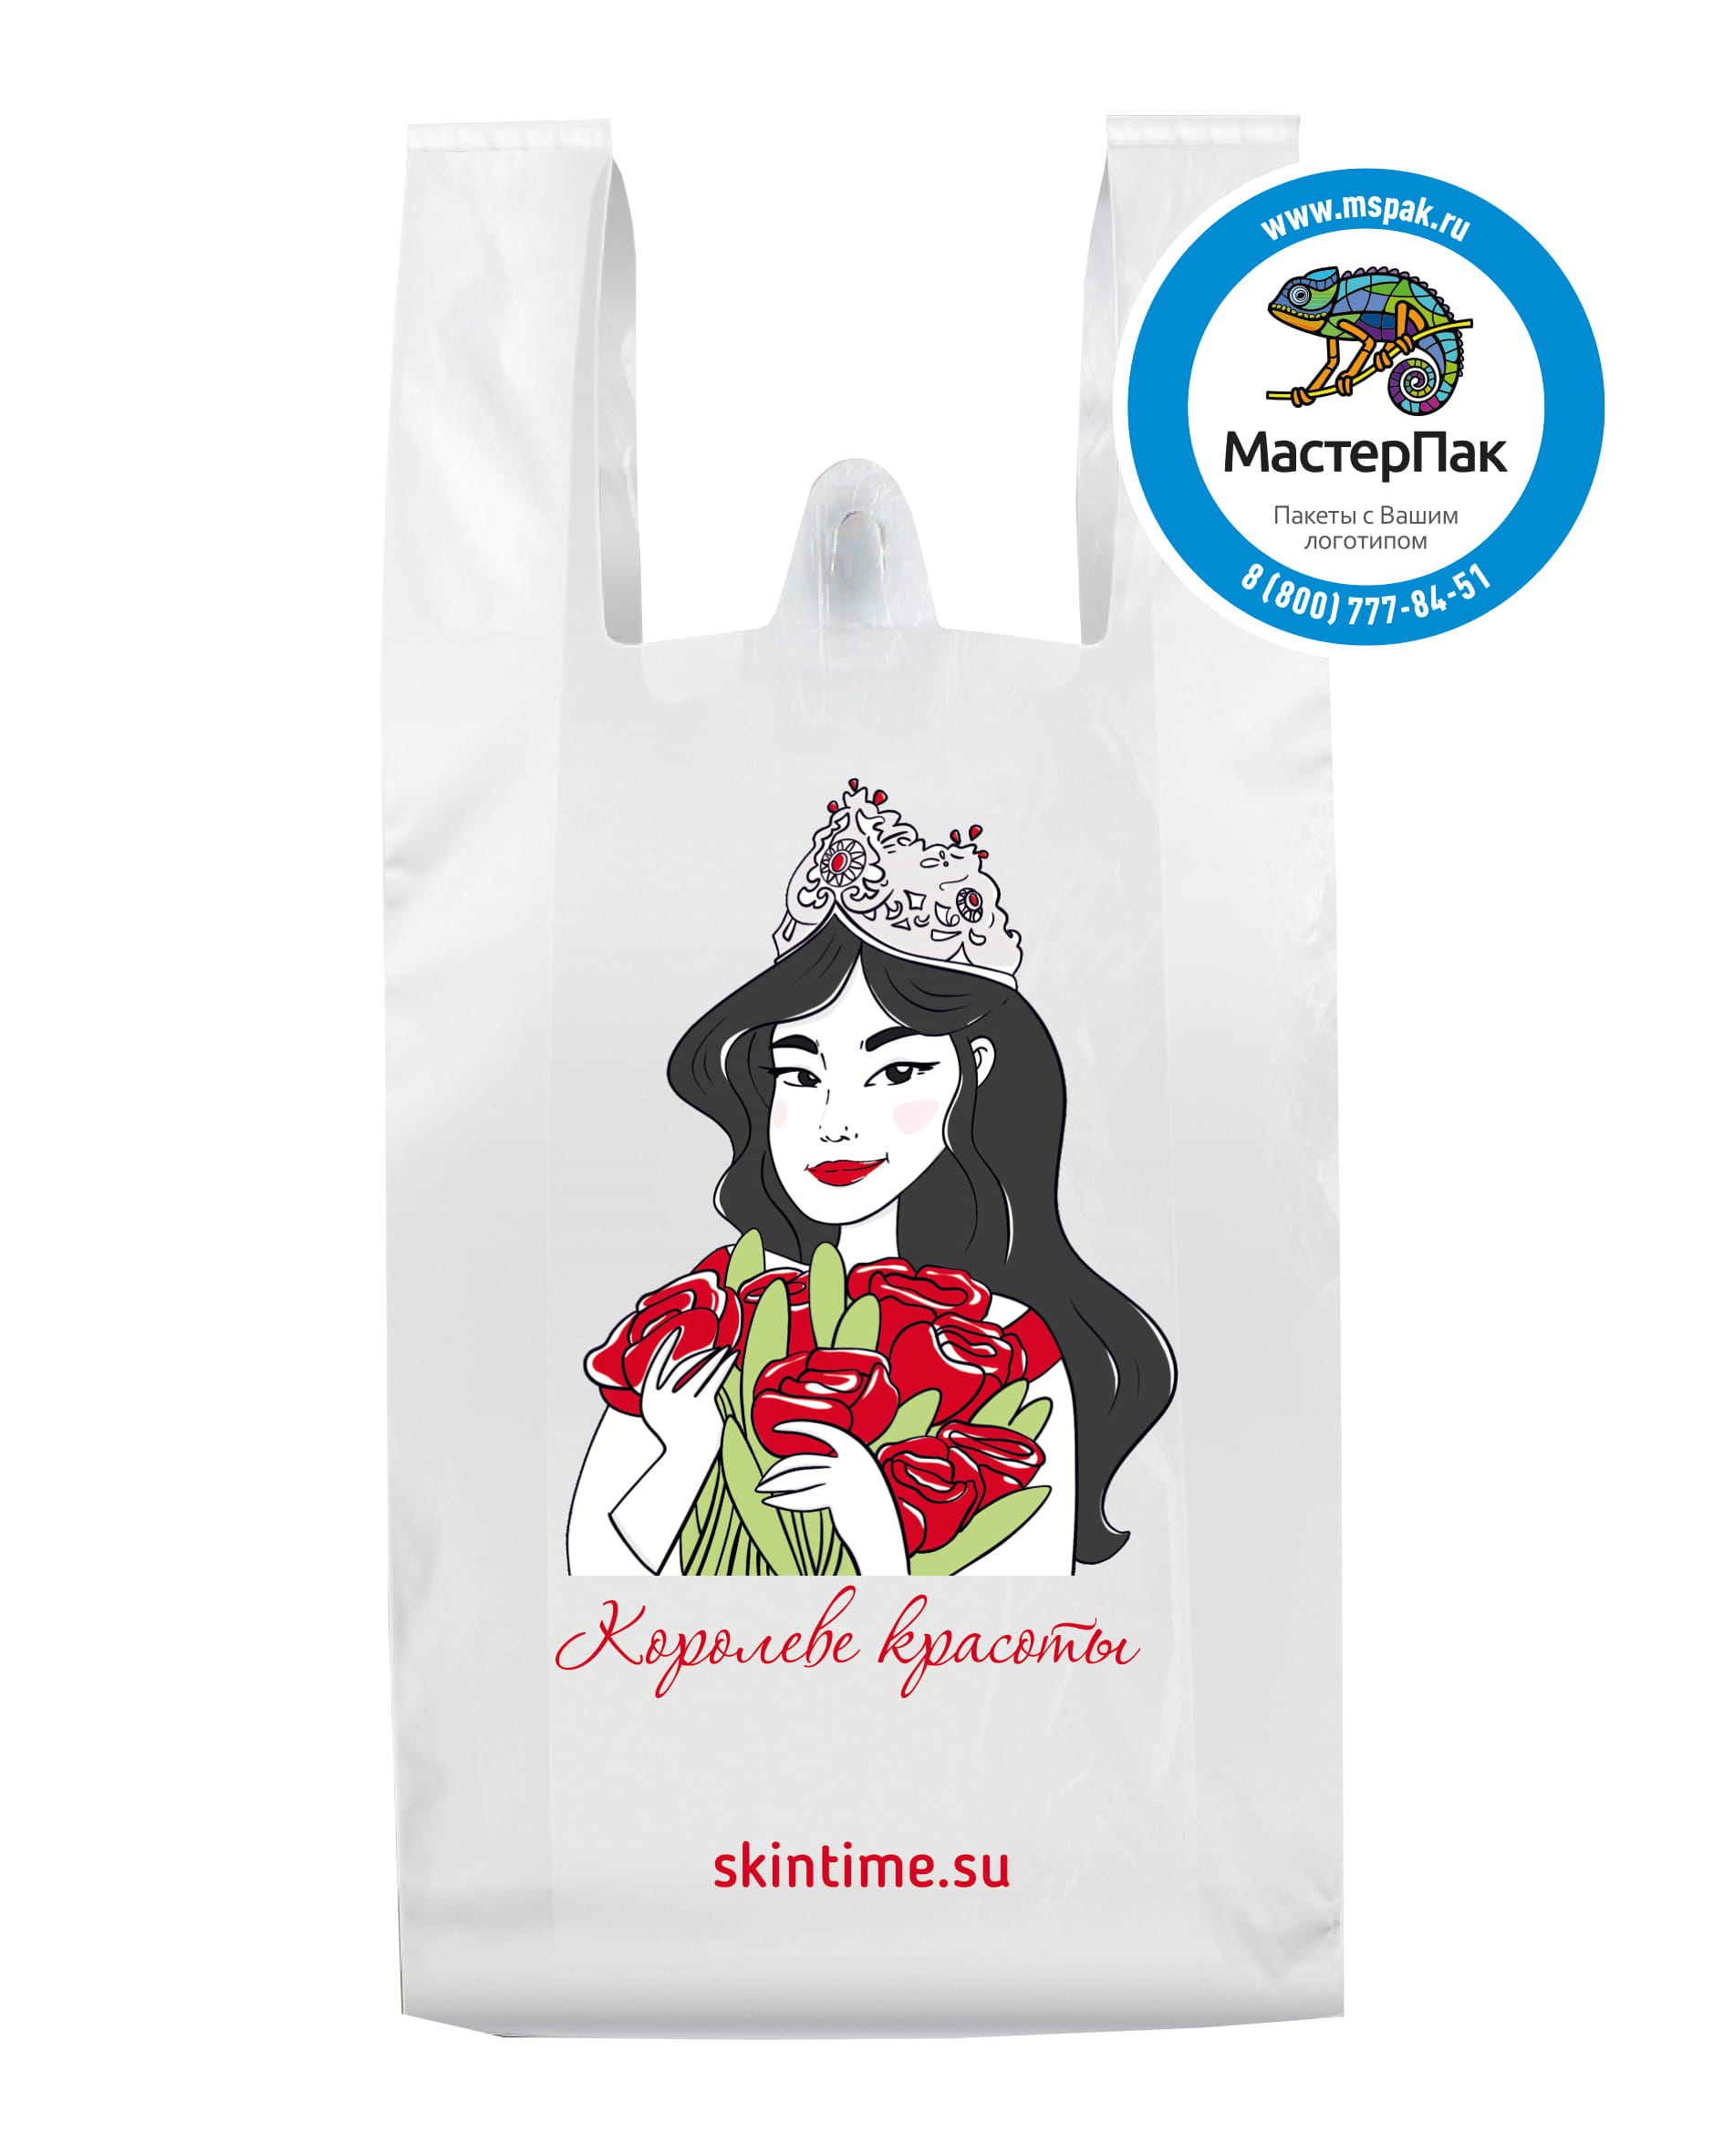 Пакет-майка ПНД с логотипом Королеве красоты, Москва